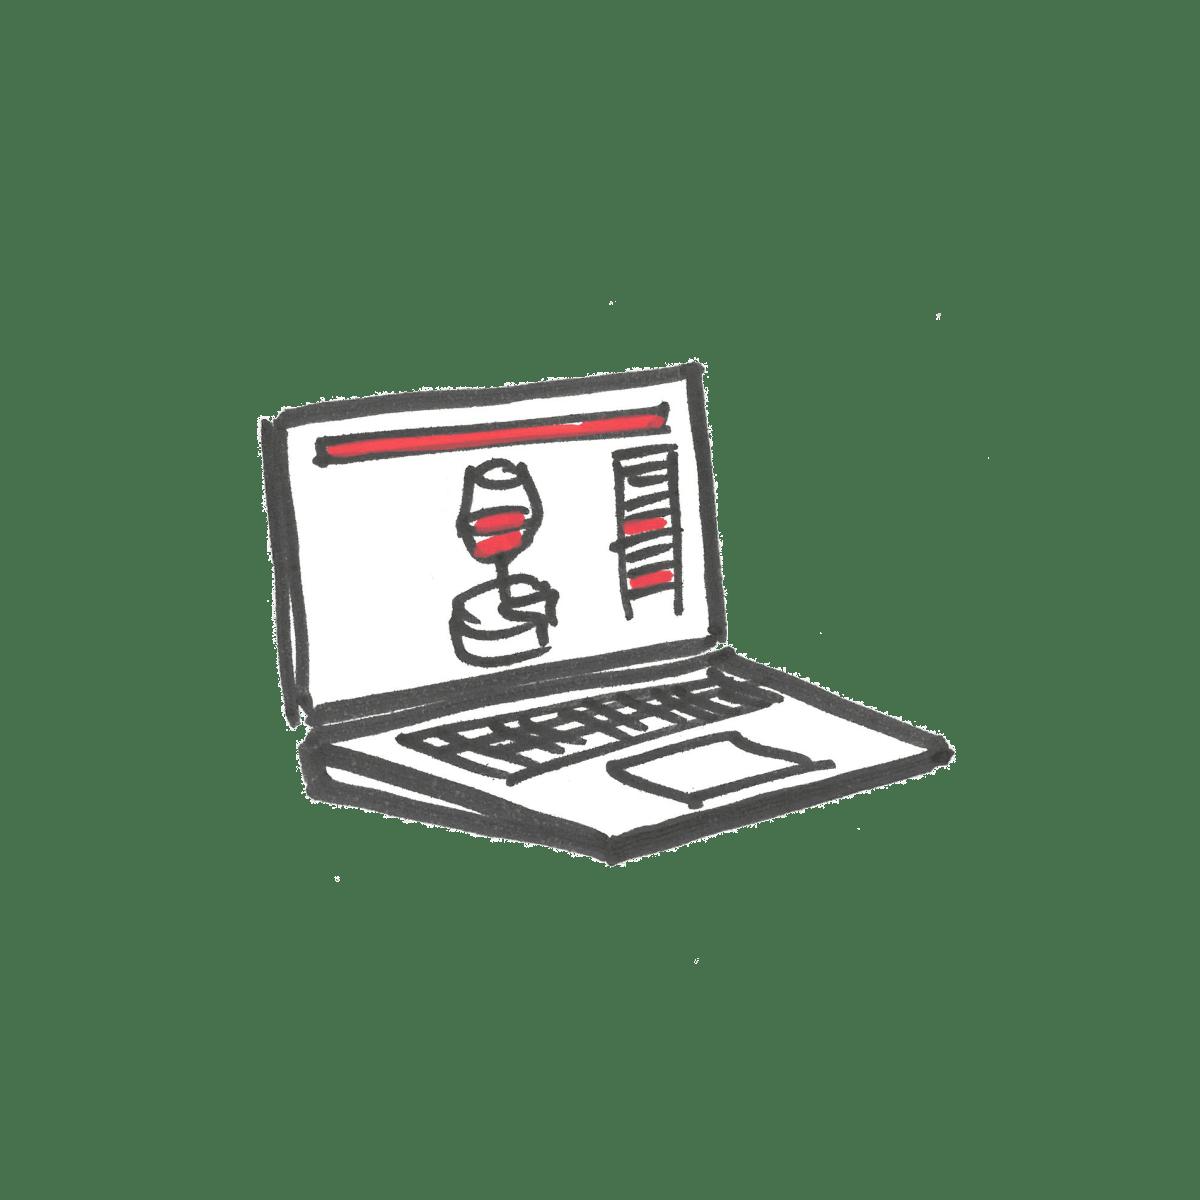 picto-commande en ligne chez stephane